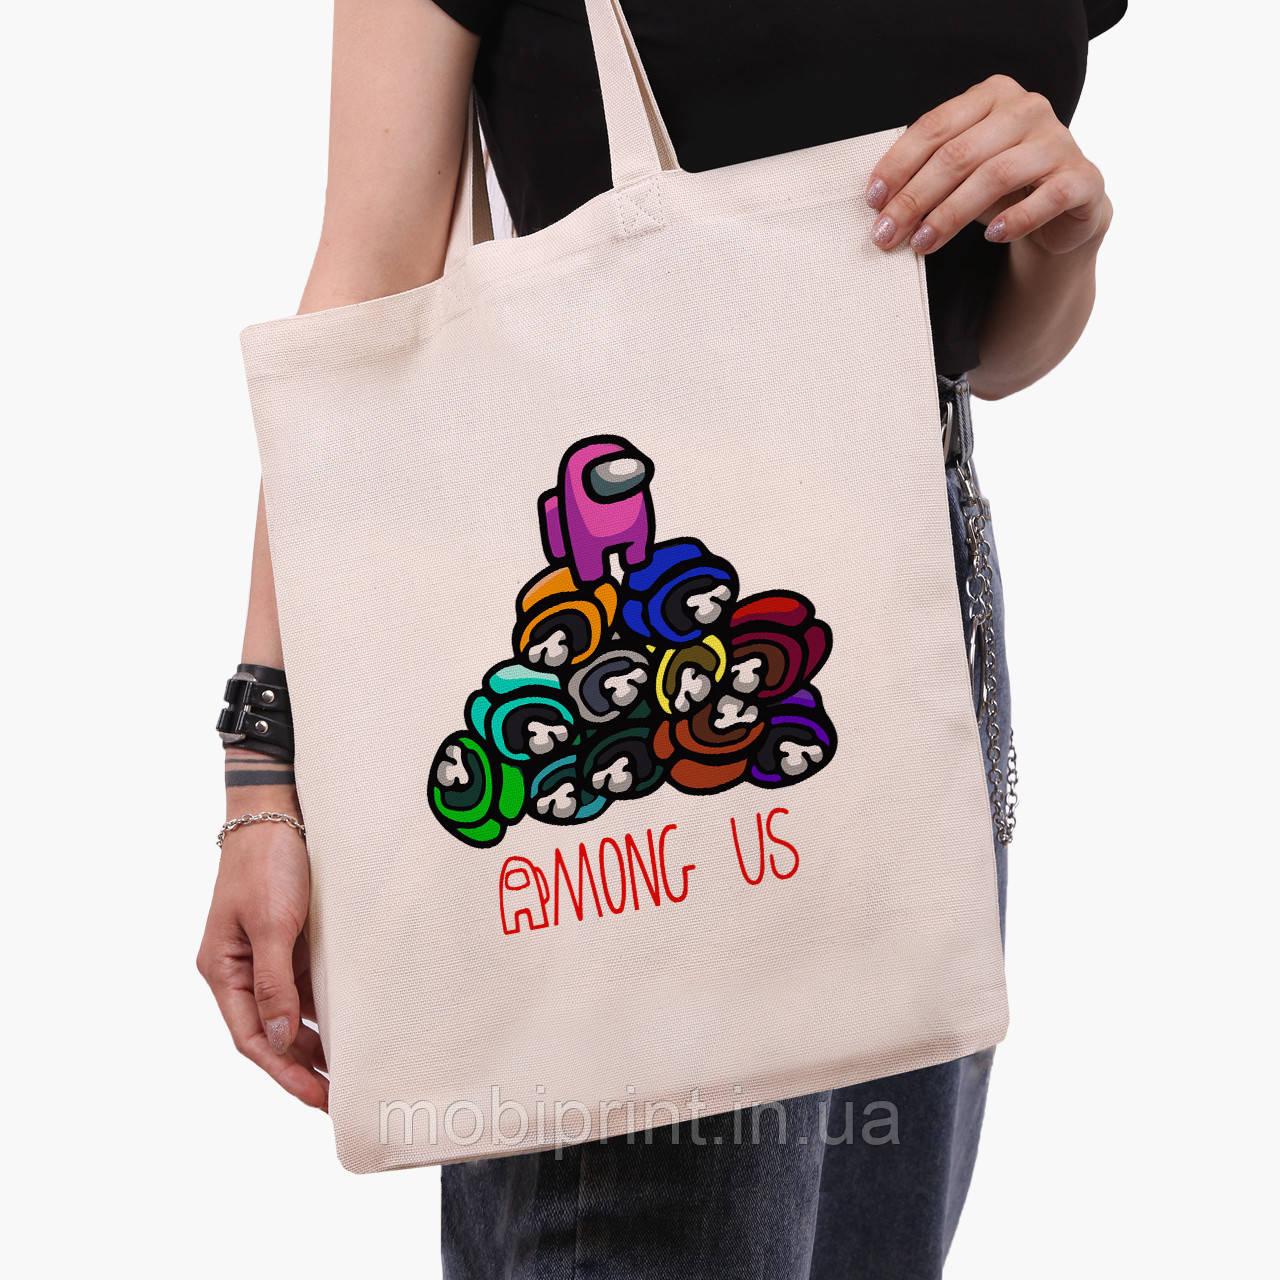 Эко сумка шоппер Амонг Ас (Among Us) (9227-2594)  41*35 см